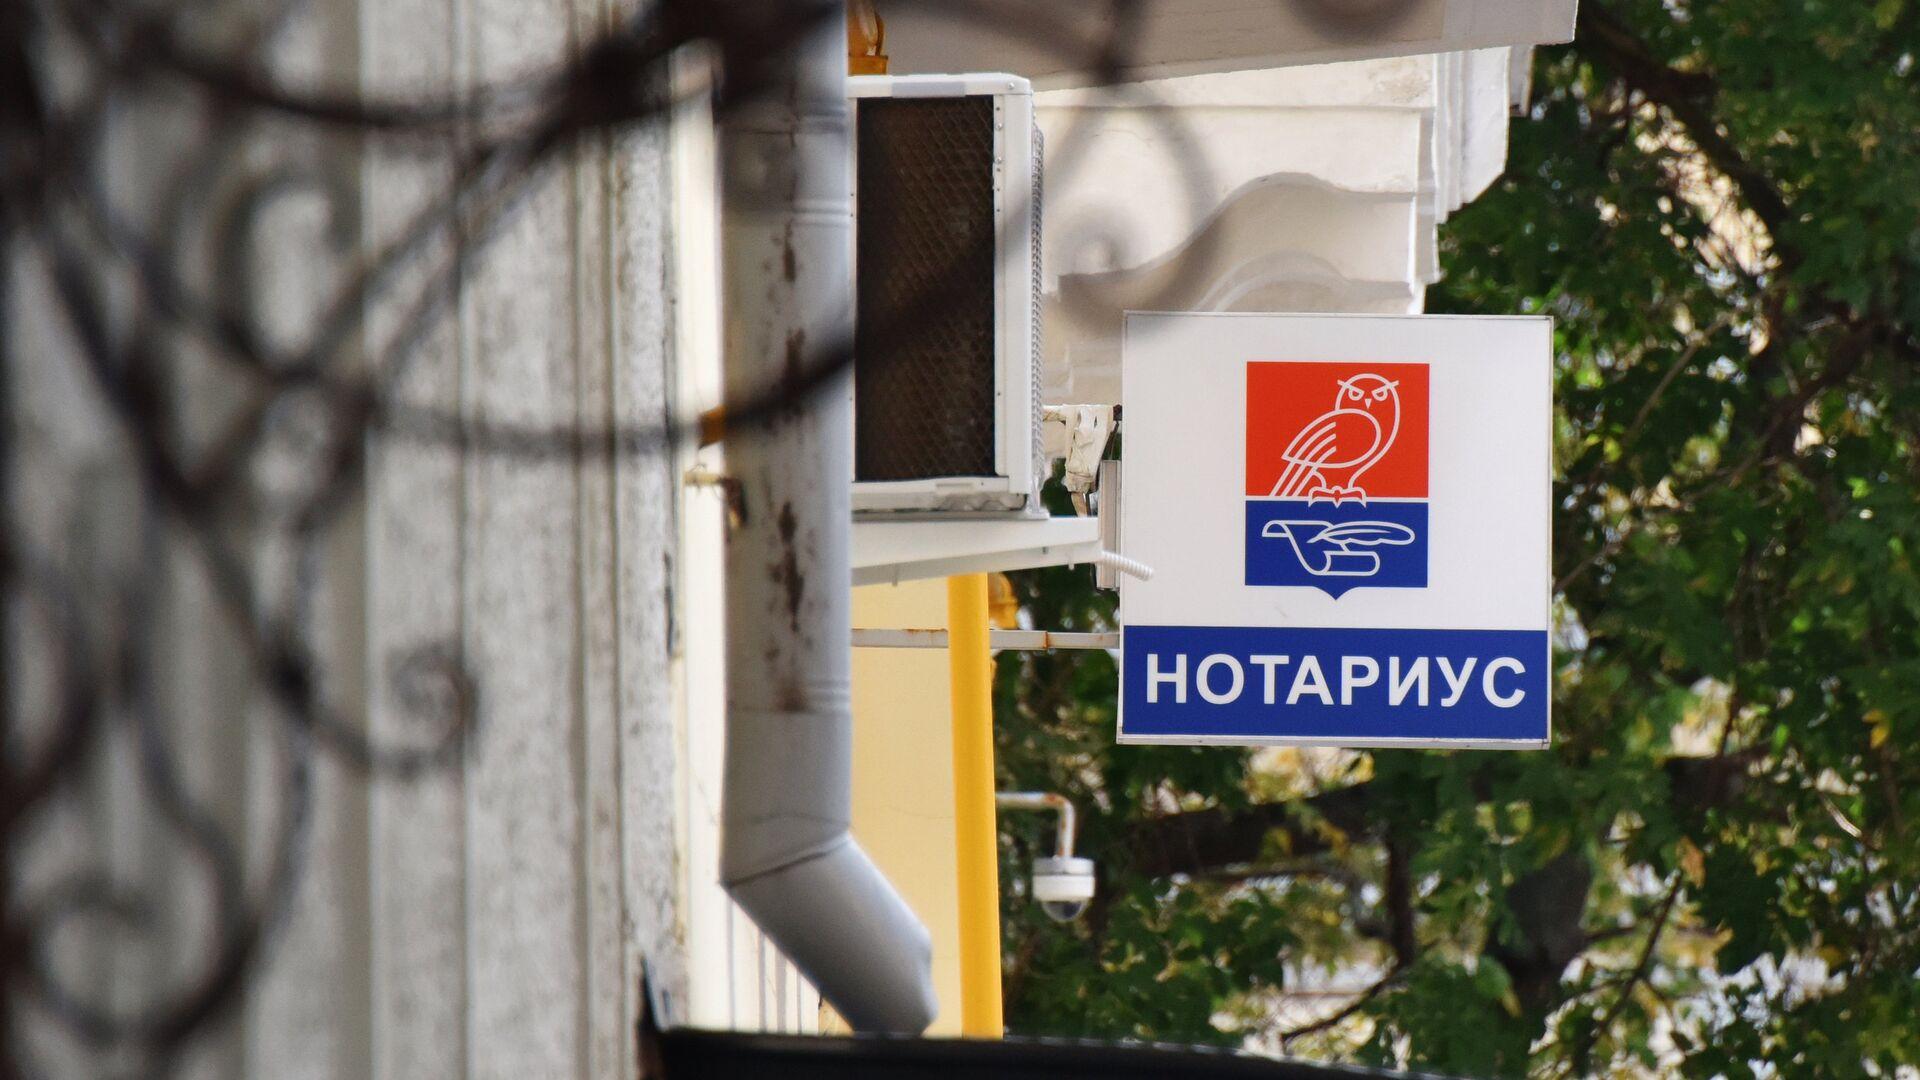 Вывеска нотариуса - РИА Новости, 1920, 05.09.2018